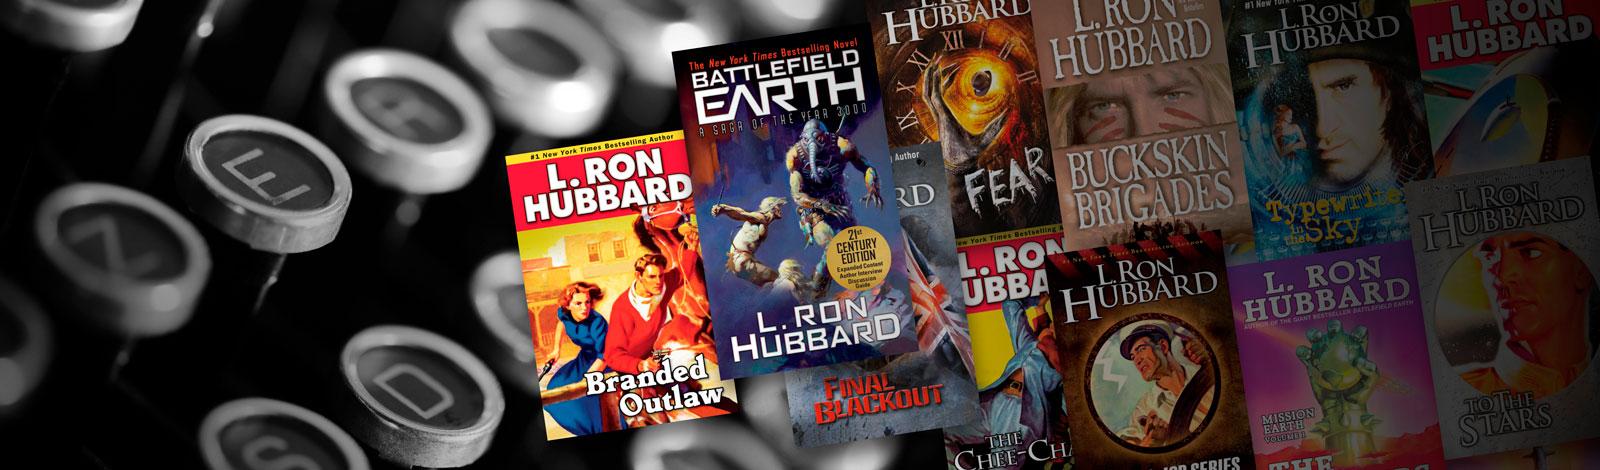 L. Ron Hubbard Fiction Books